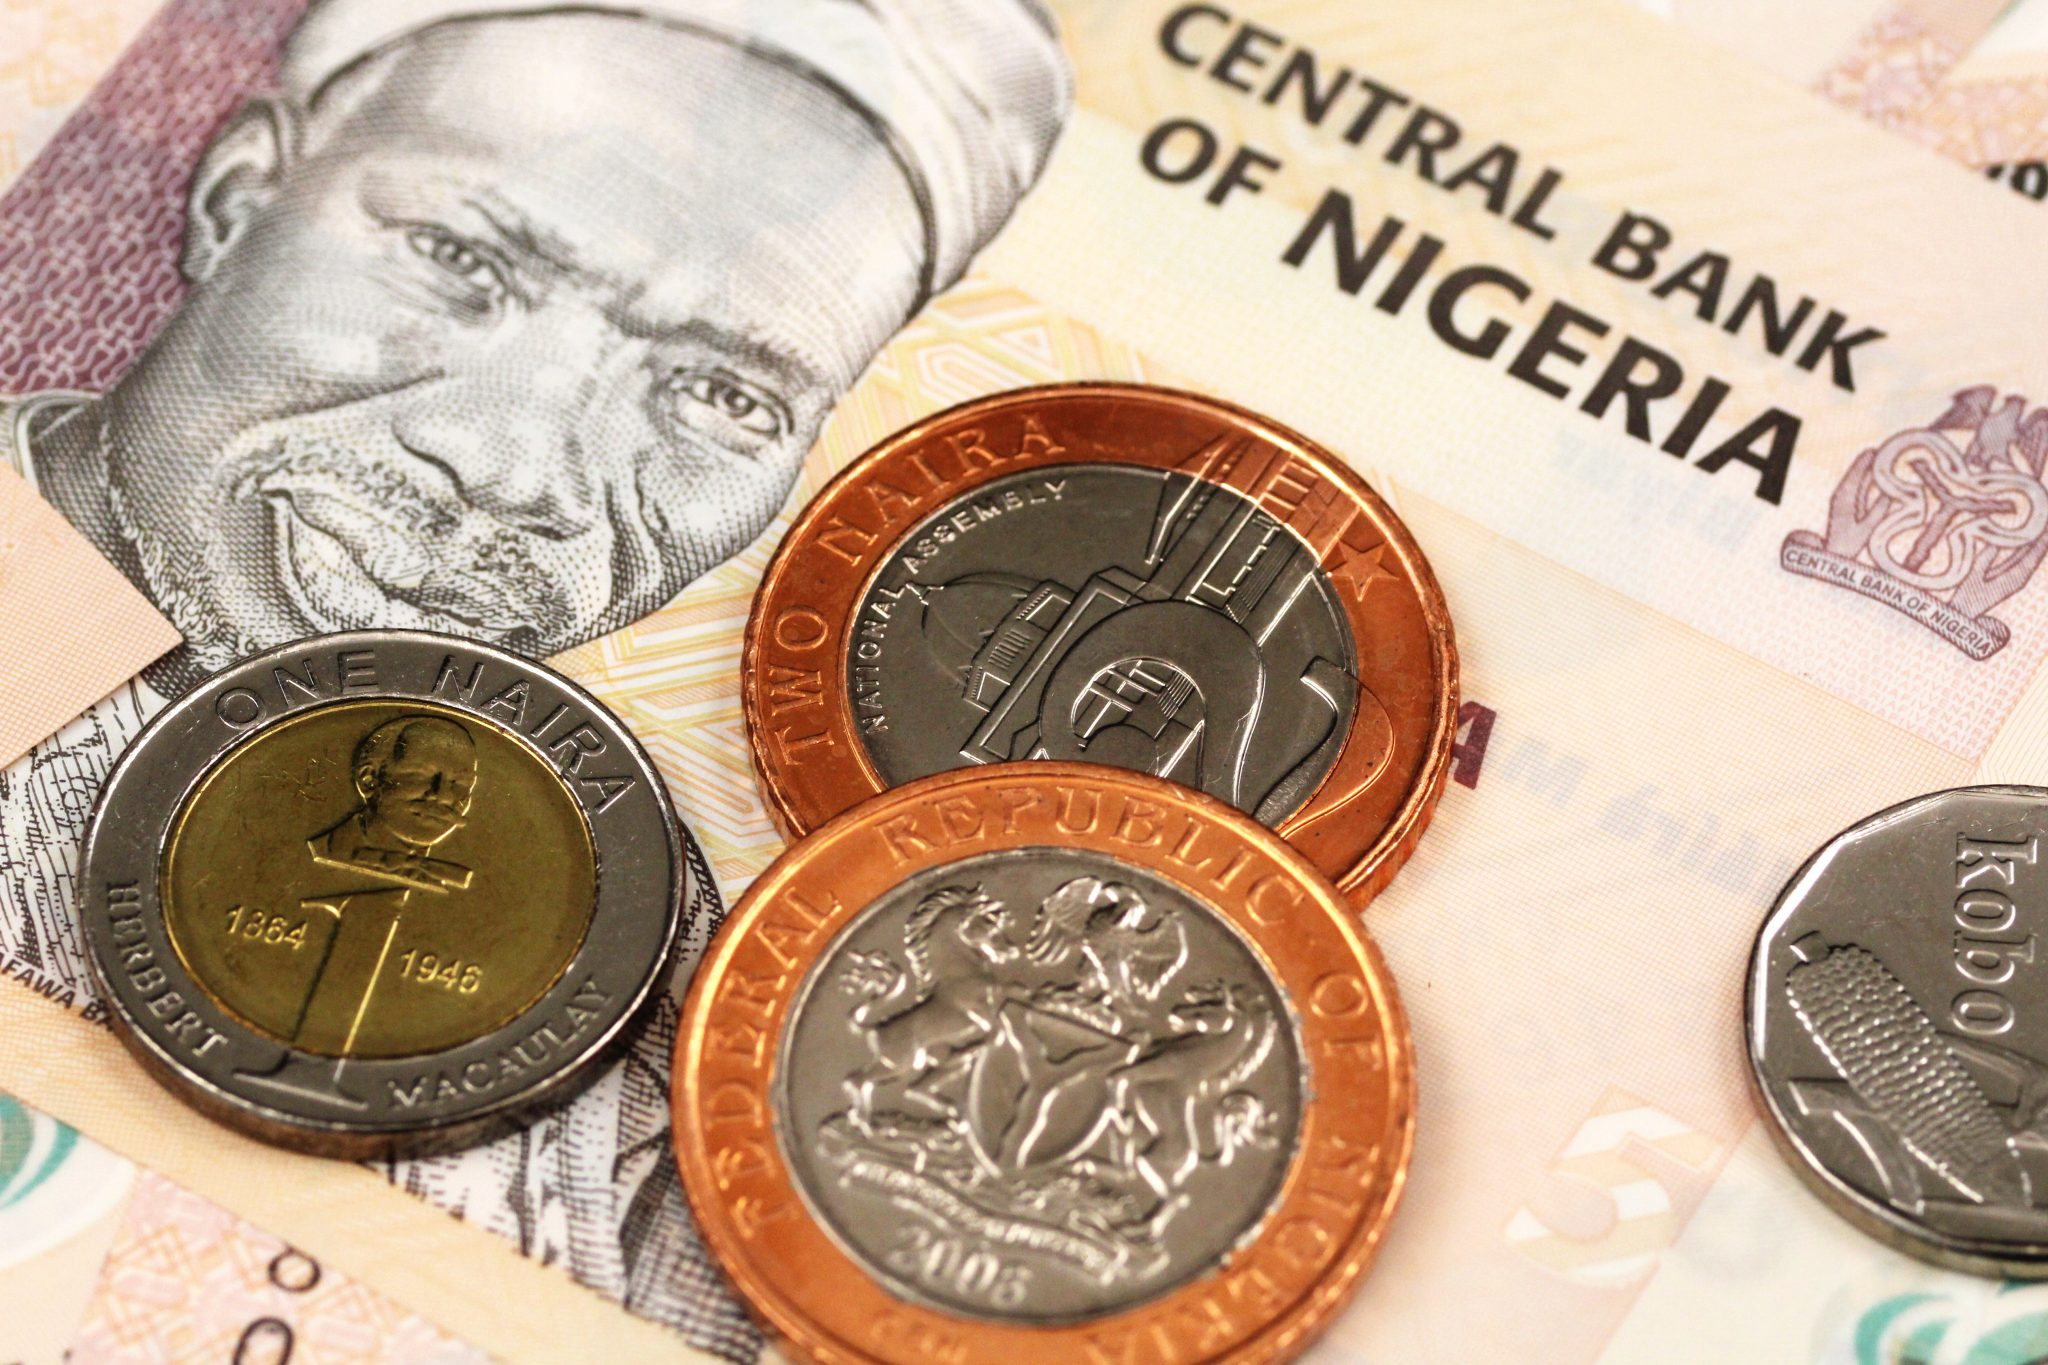 A Close Up Image Of Nigerian Money